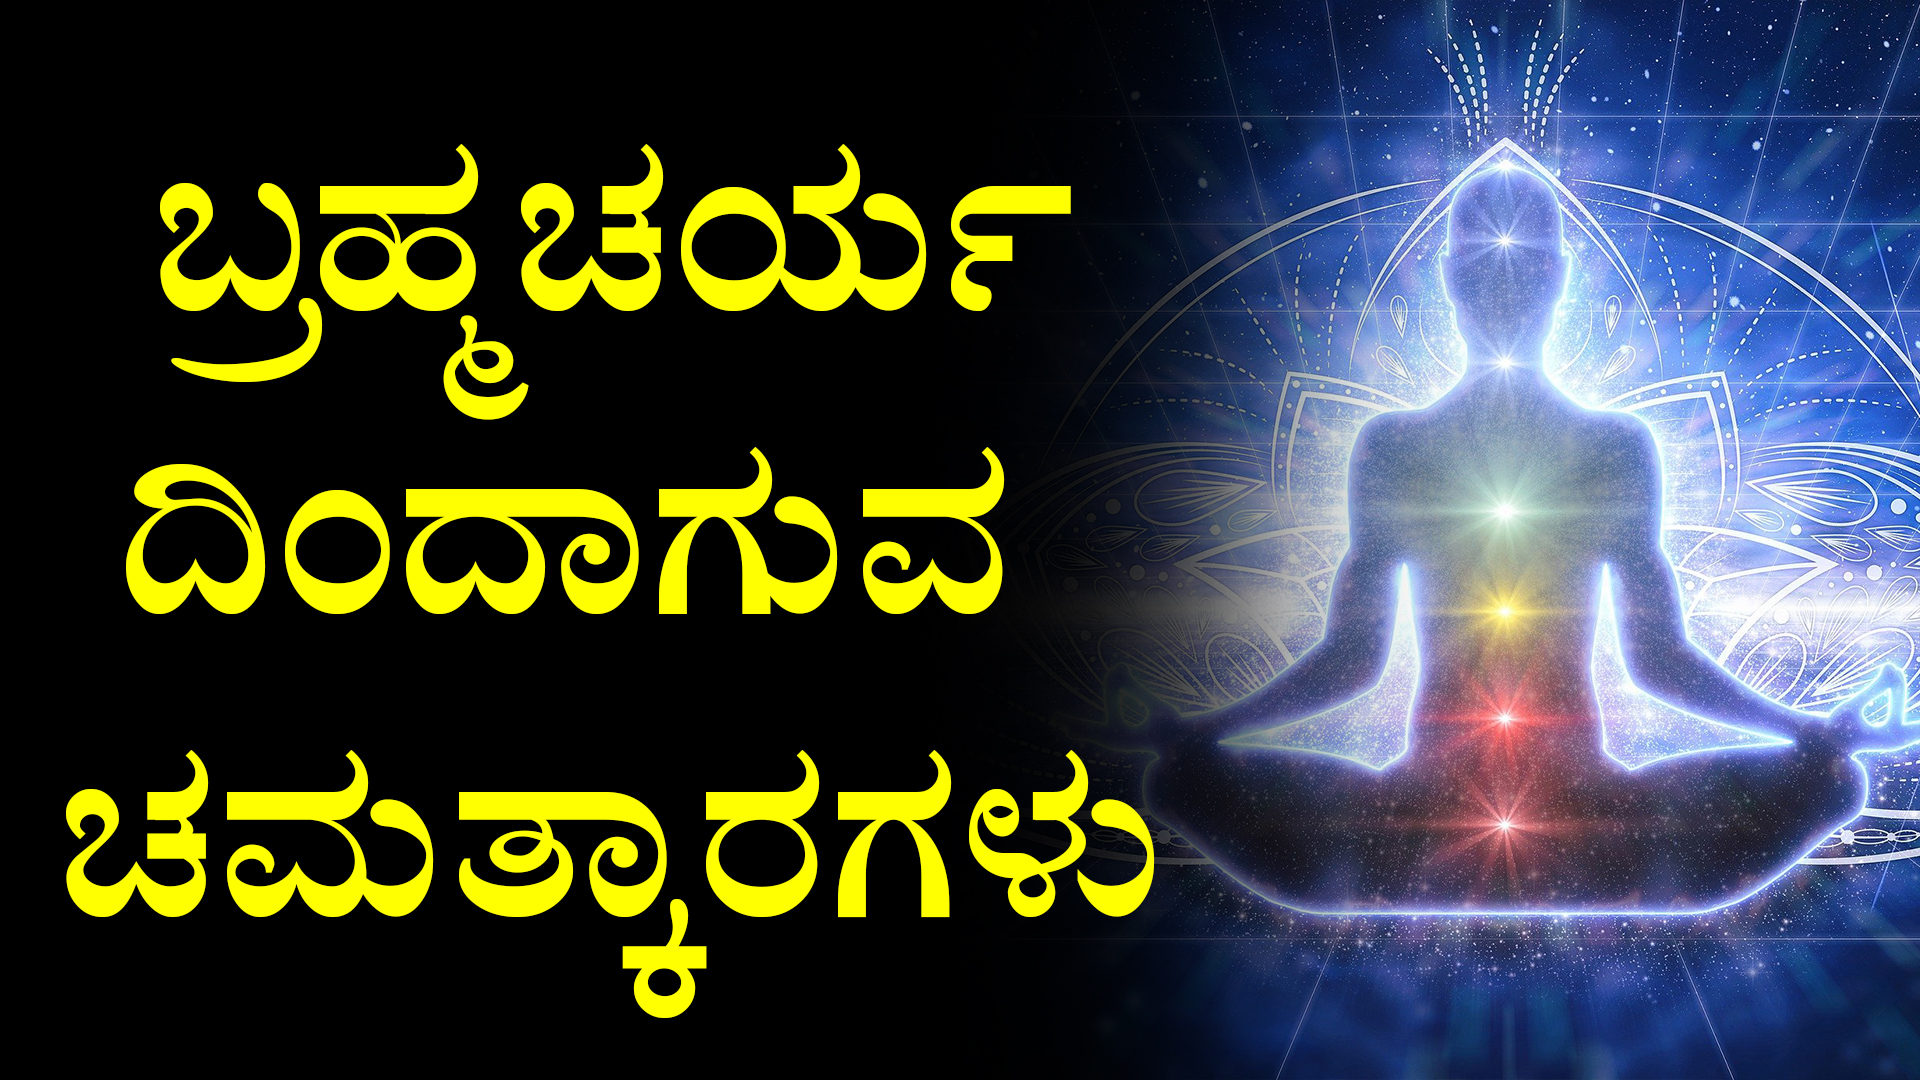 Benefits of Brahmacharya Celibacy in Kannada